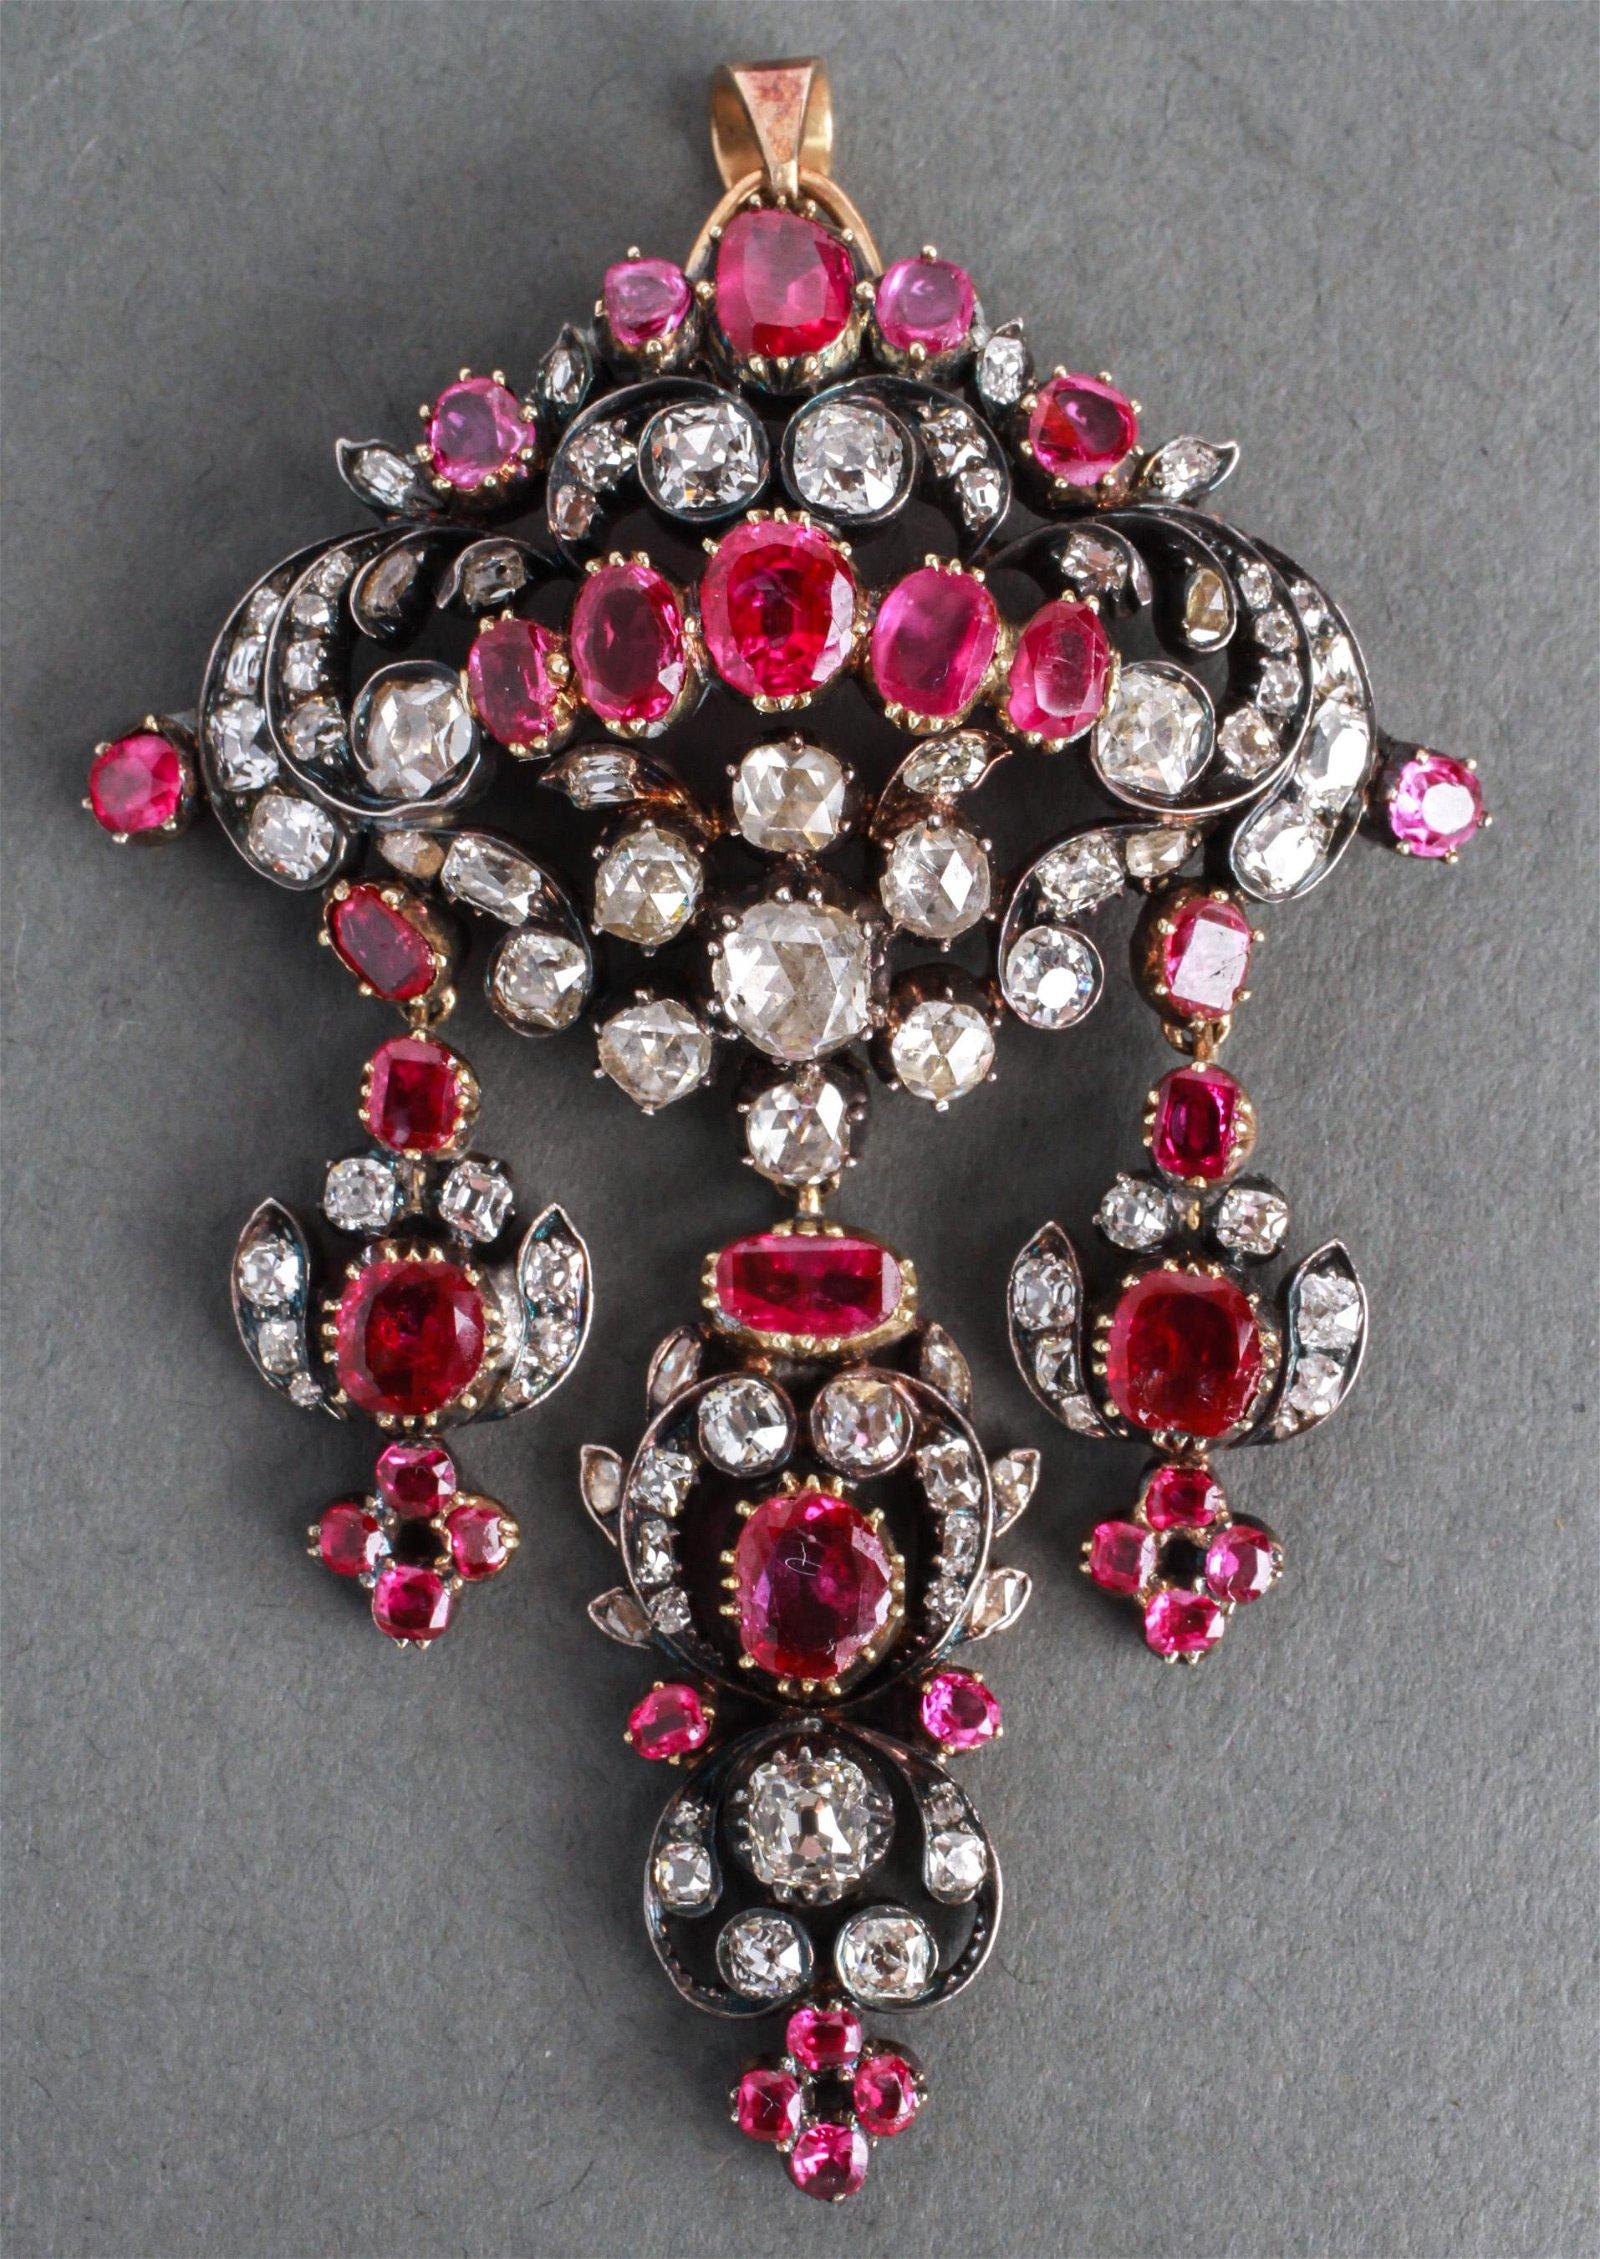 14K Gold & Silver Diamonds & Rubies Pendant 19th C